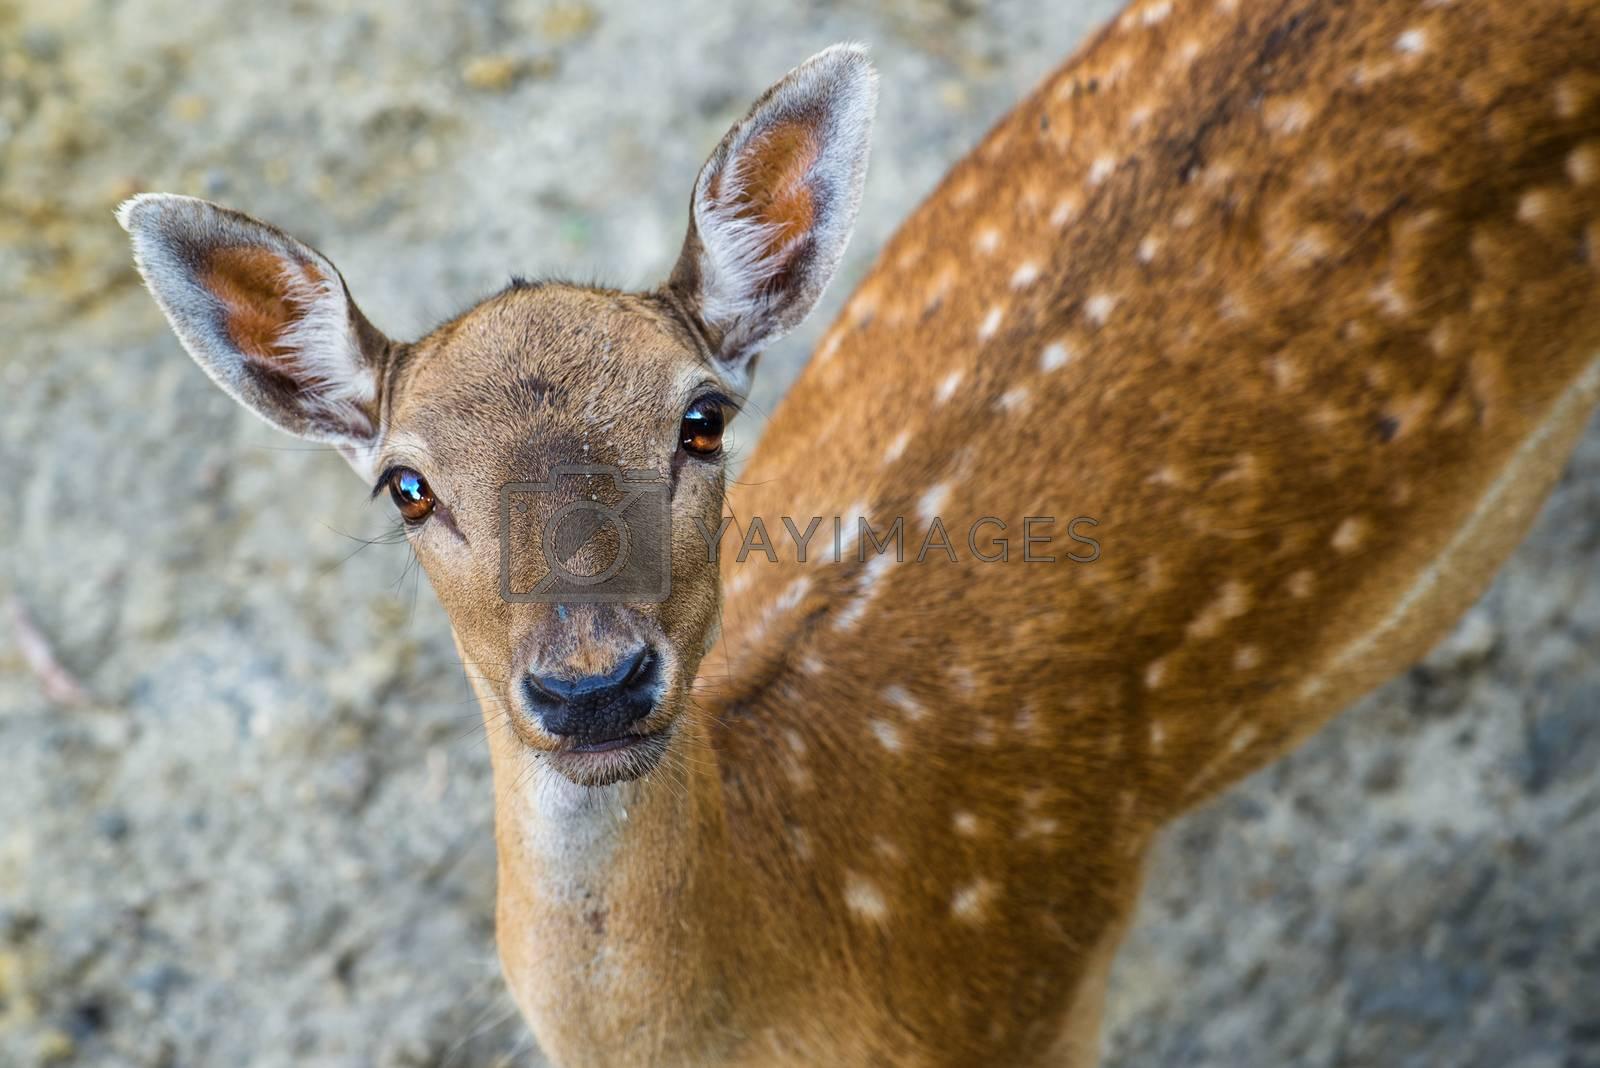 Beautiful young fallow deer, wild animal in natural surrounding looking at camera